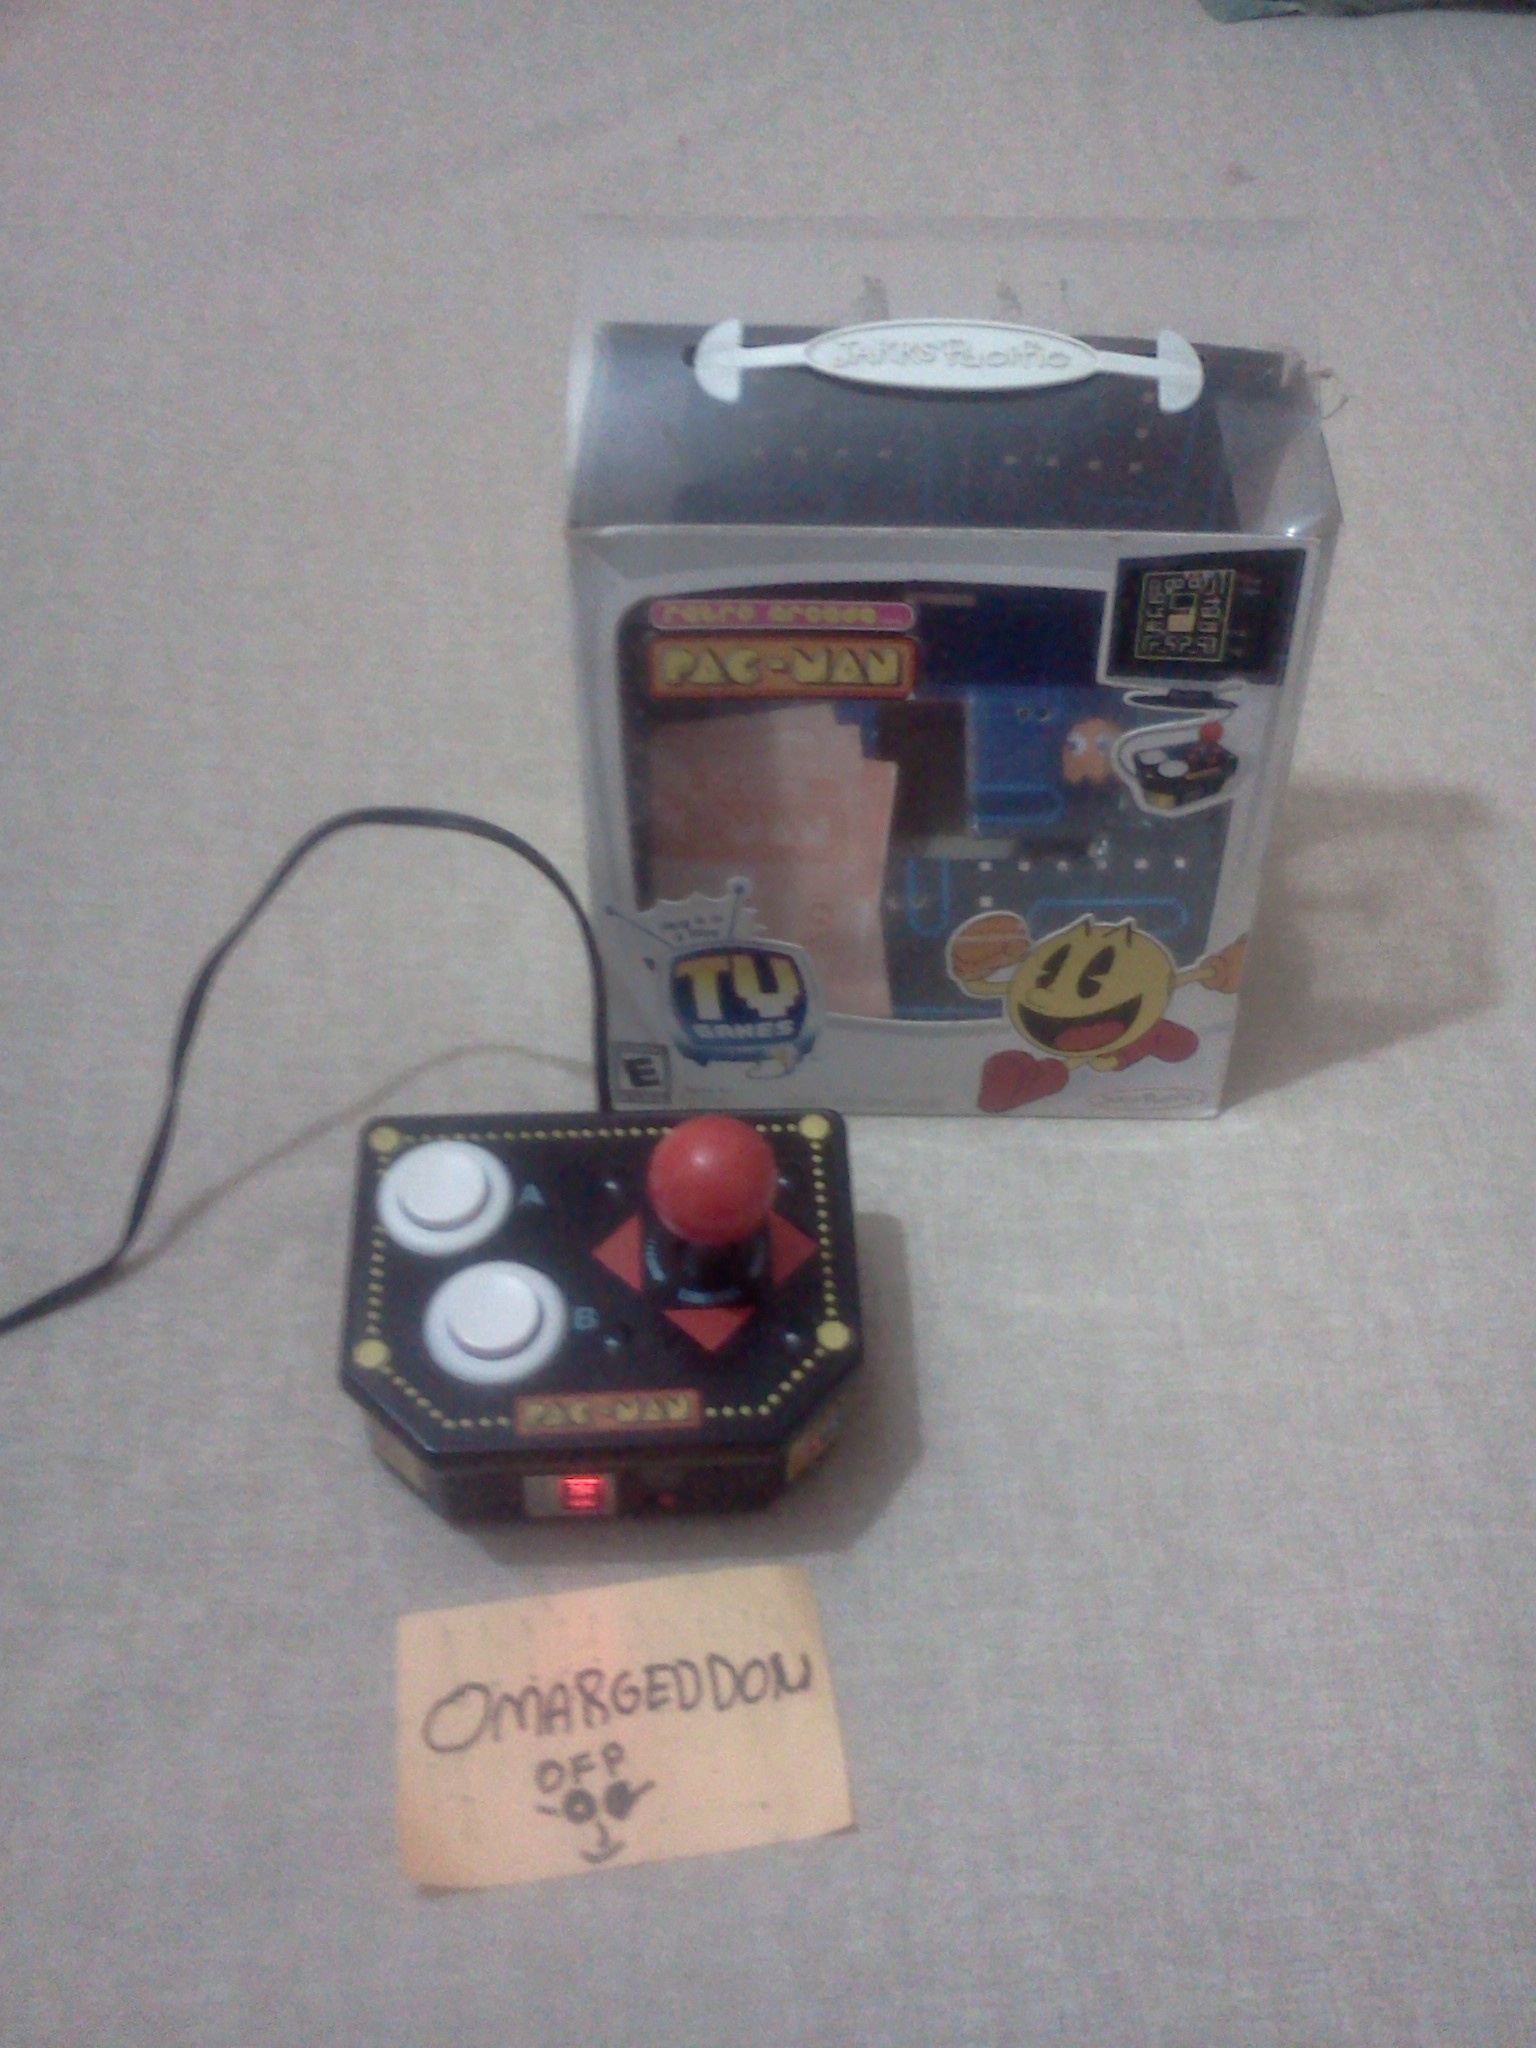 omargeddon: Dig Dug (Jakks Pacific Retro Arcade Pac-Man) 46,700 points on 2016-07-24 00:07:10